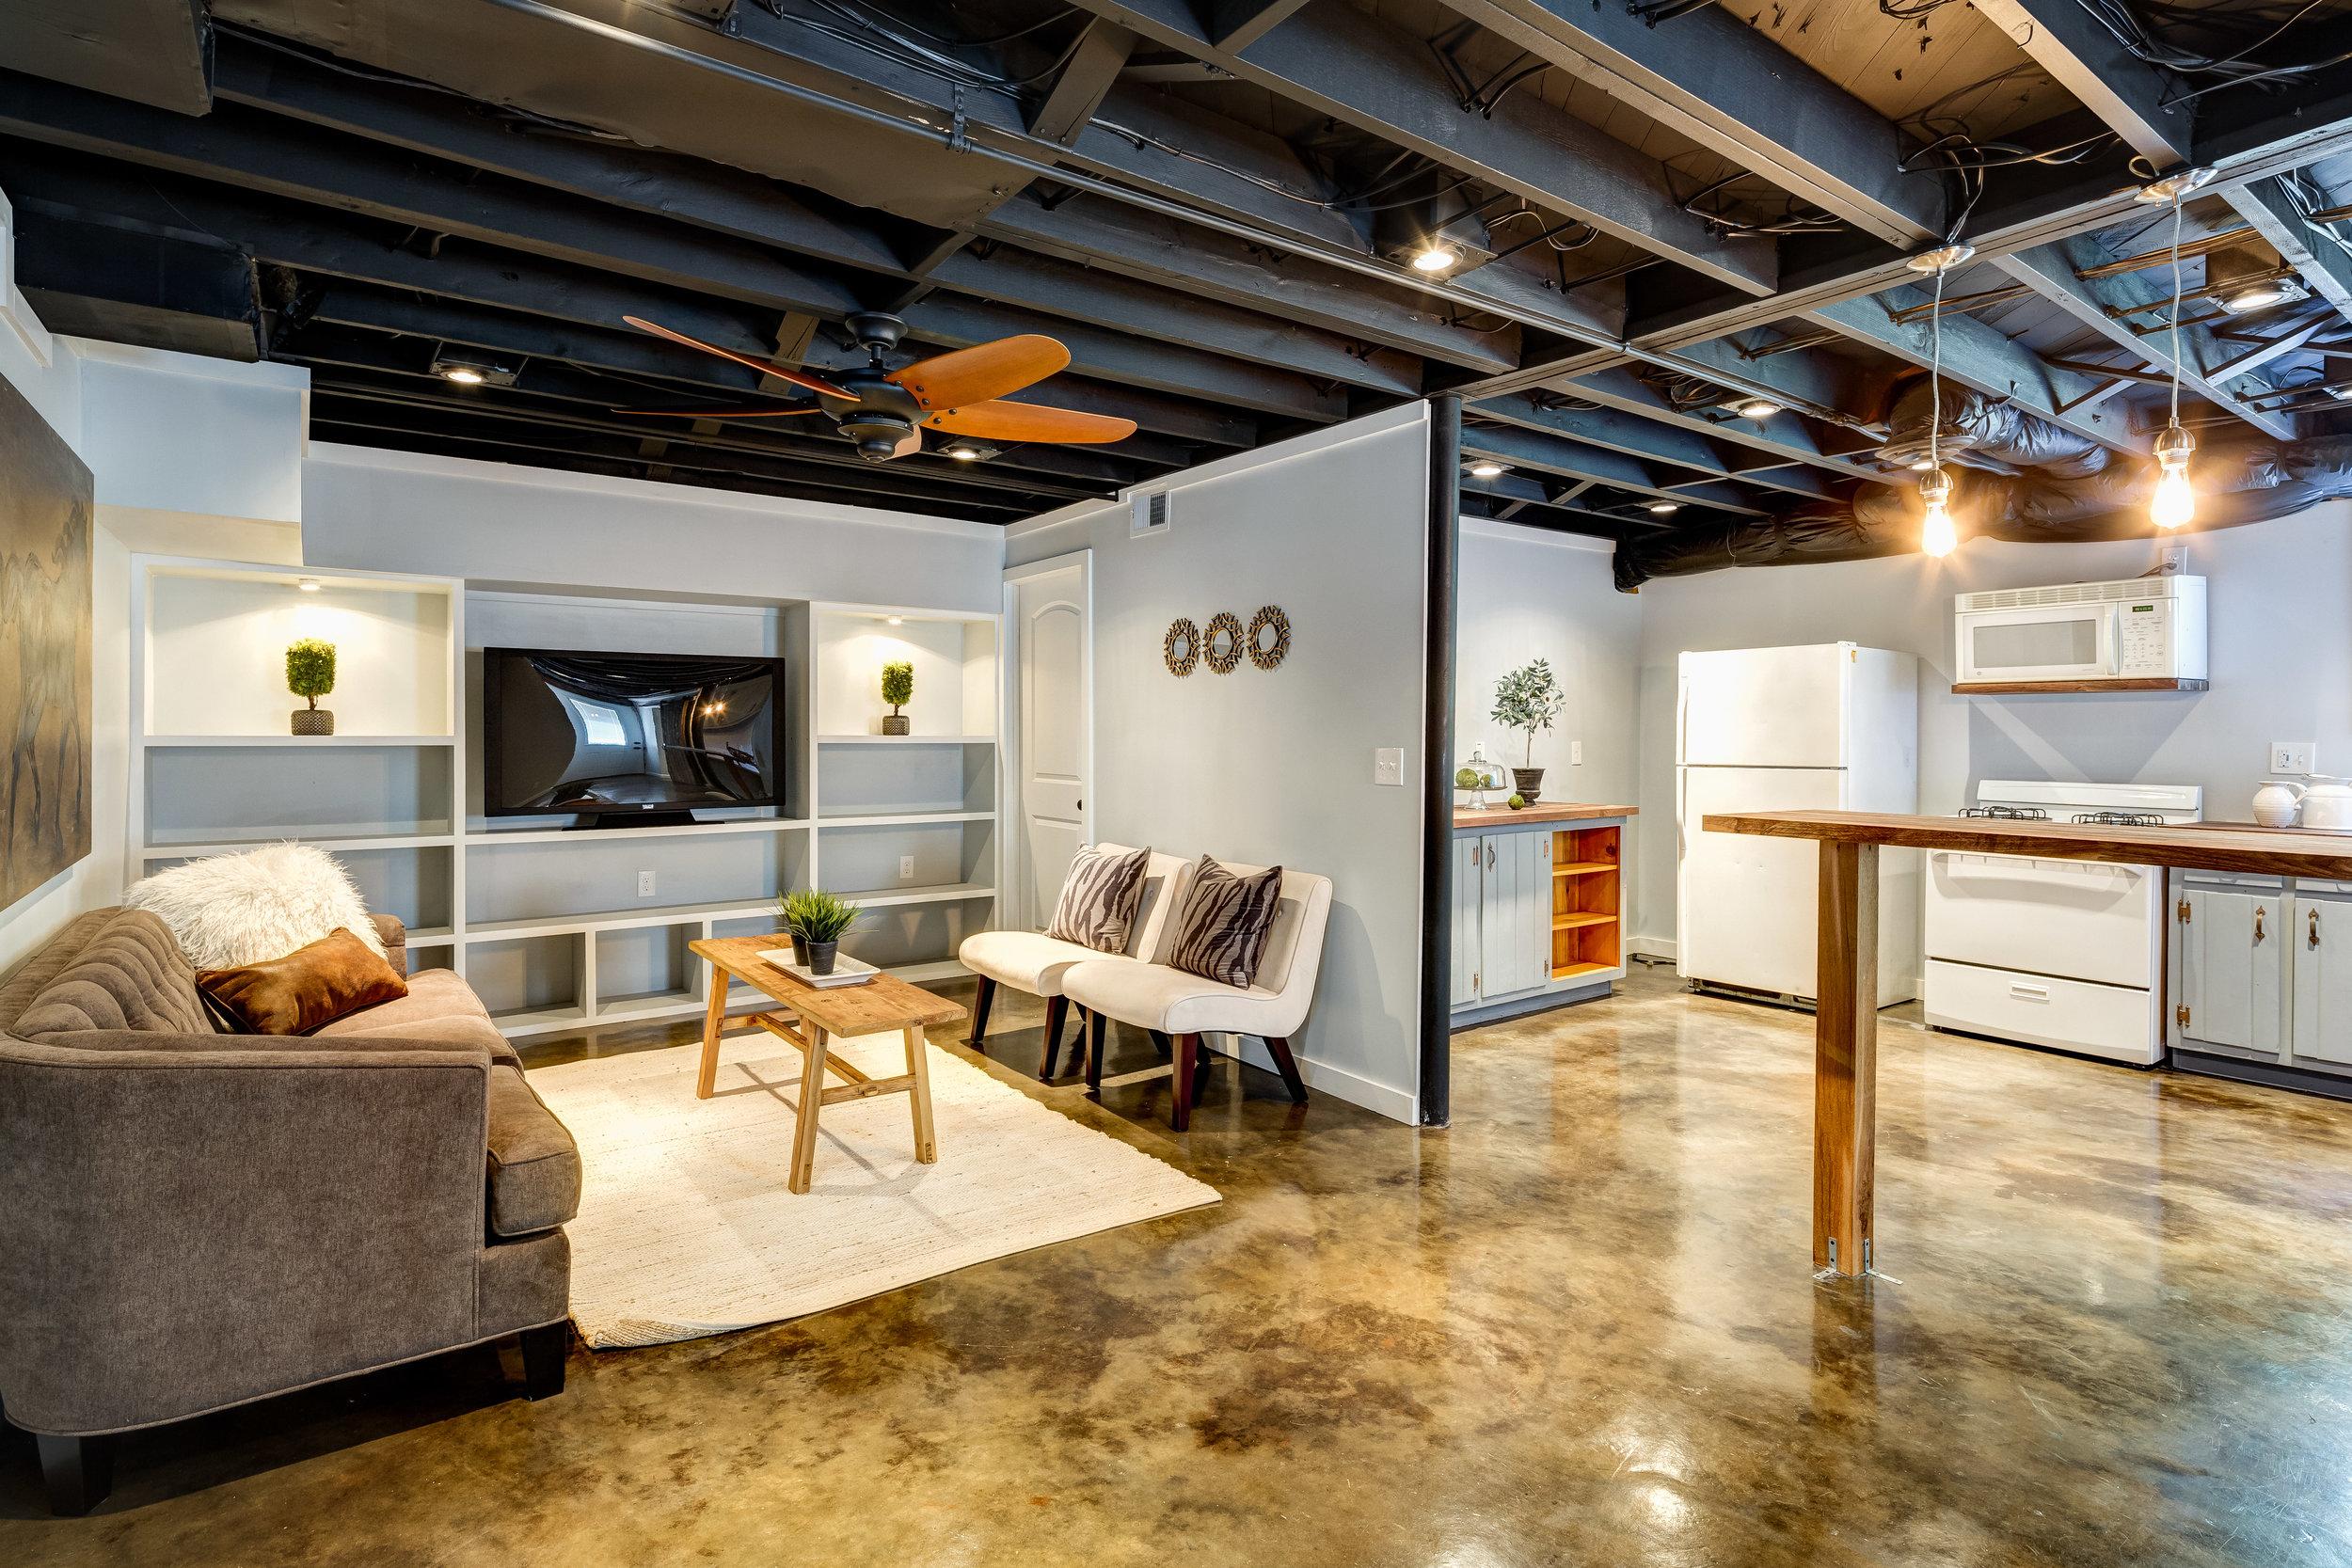 smyrna basement completion atlanta renovation